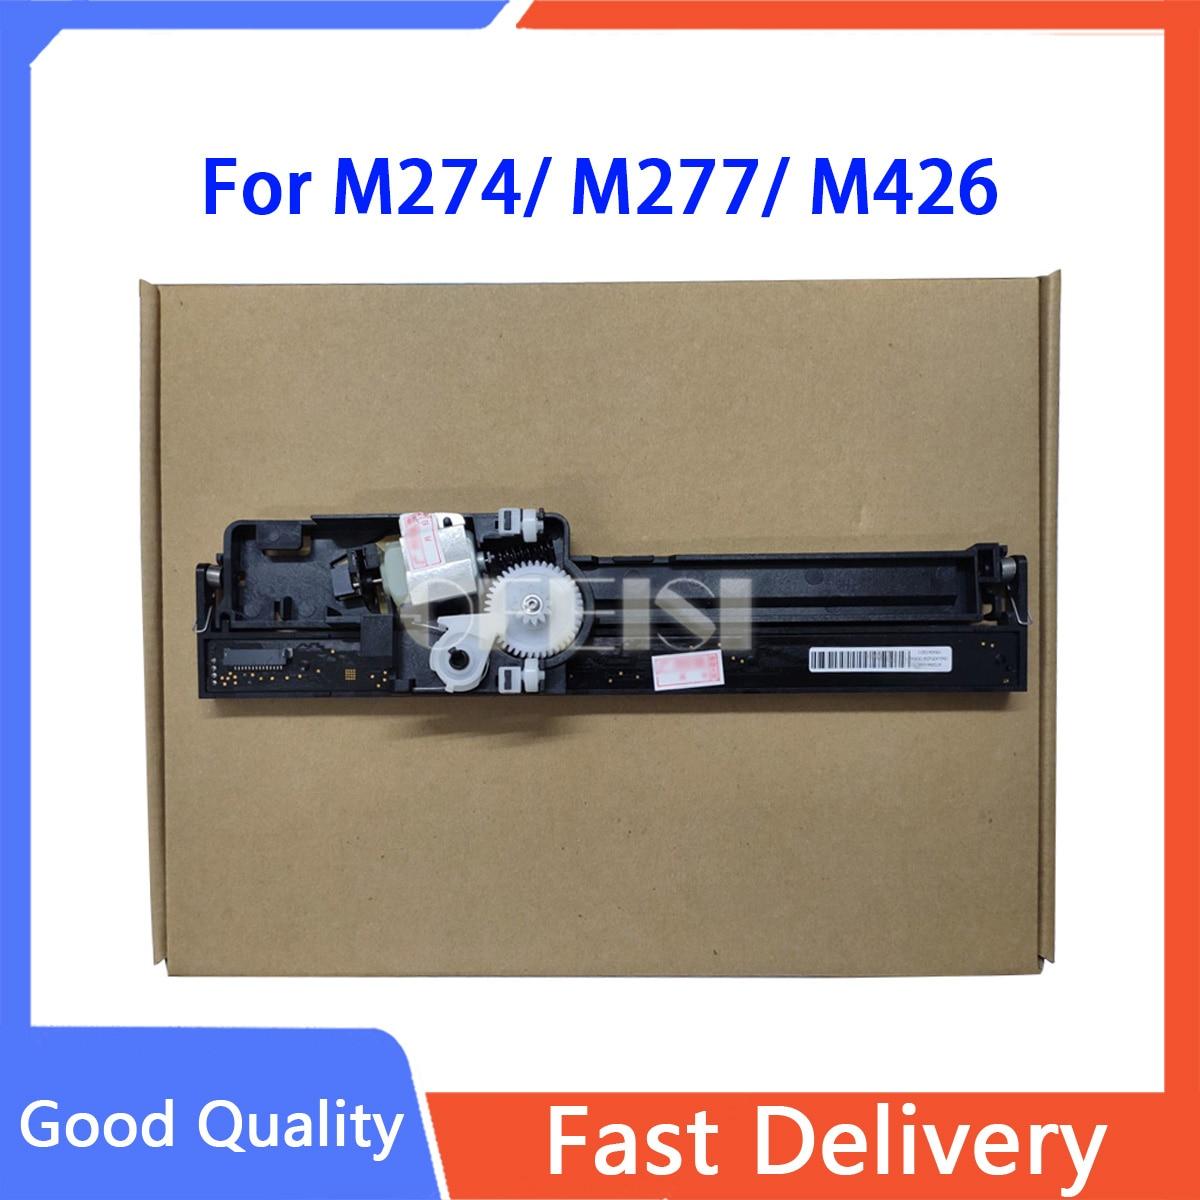 B3Q10-40034 B3Q10-40034 للون ليزر جيت برو MFP HP M274/ M277/ M426/ M427/ M477 نسخة الماسح الضوئي assy/طابعة الماسح الضوئي/مسح الرأس